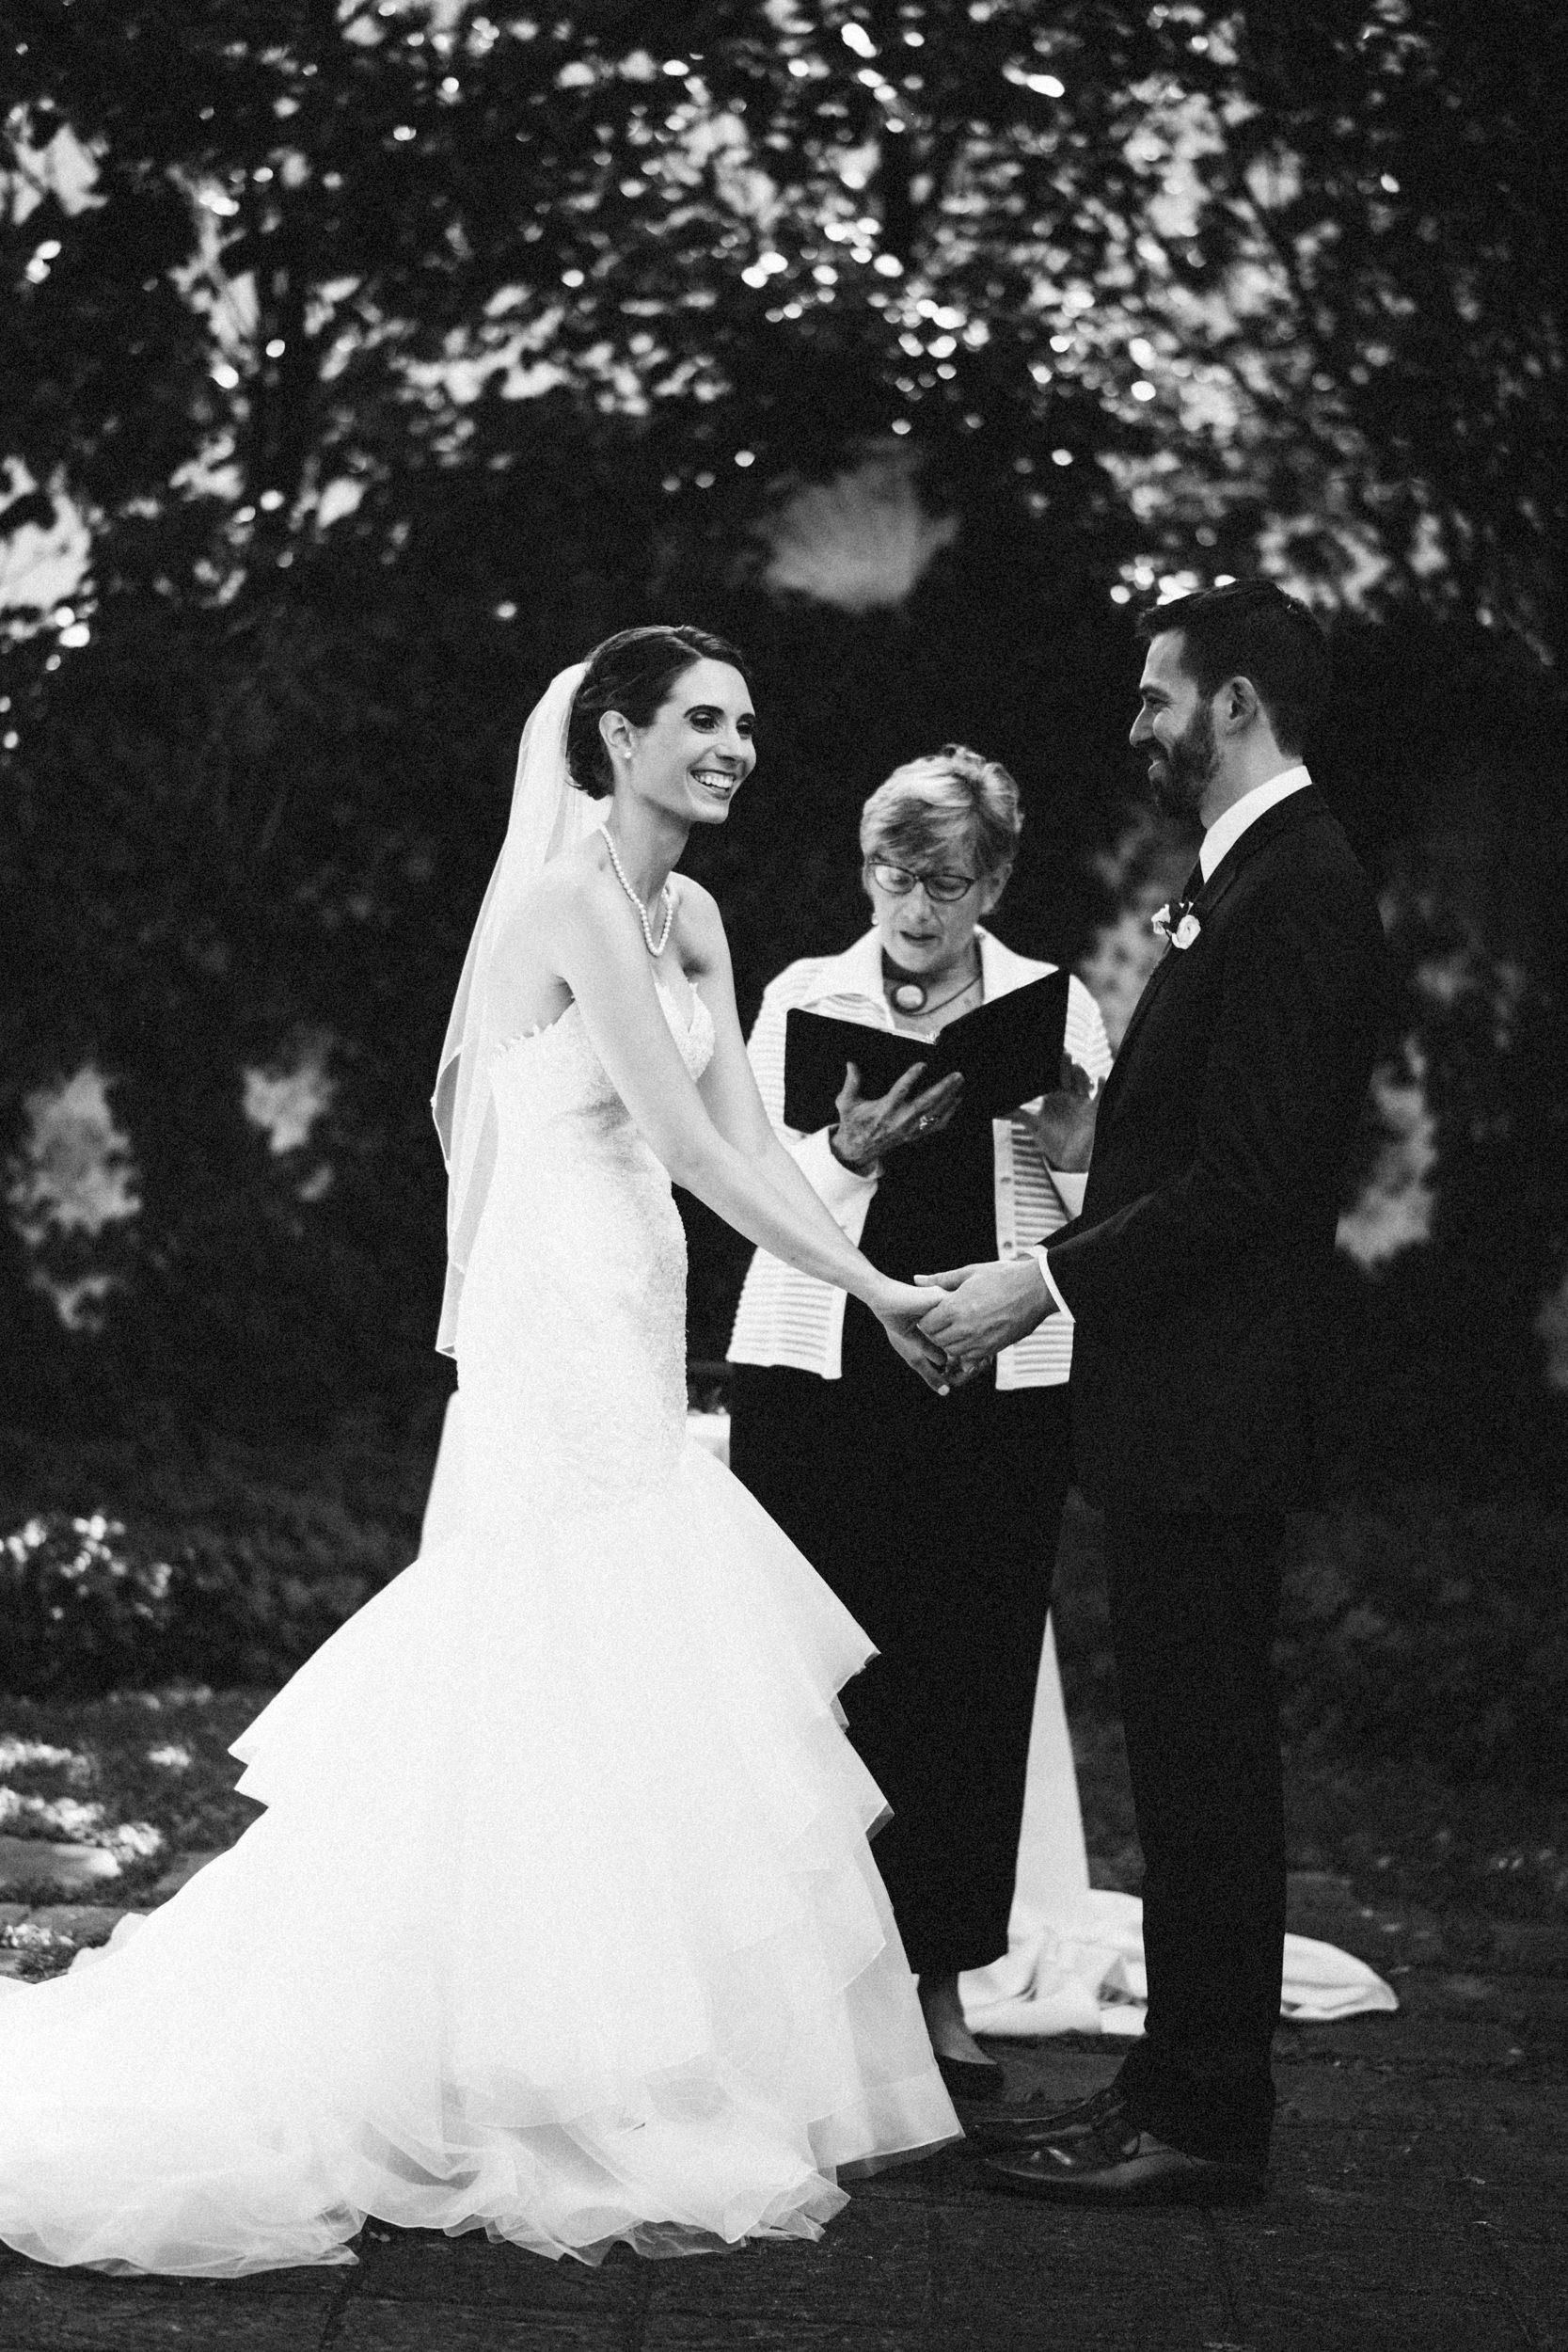 Louisville-Kentucky-Wedding-Elopement-Photographer-Sarah-Katherine-Davis-Photography-Whitehall-Classic-Timeless-Garden-Wedding-375.jpg